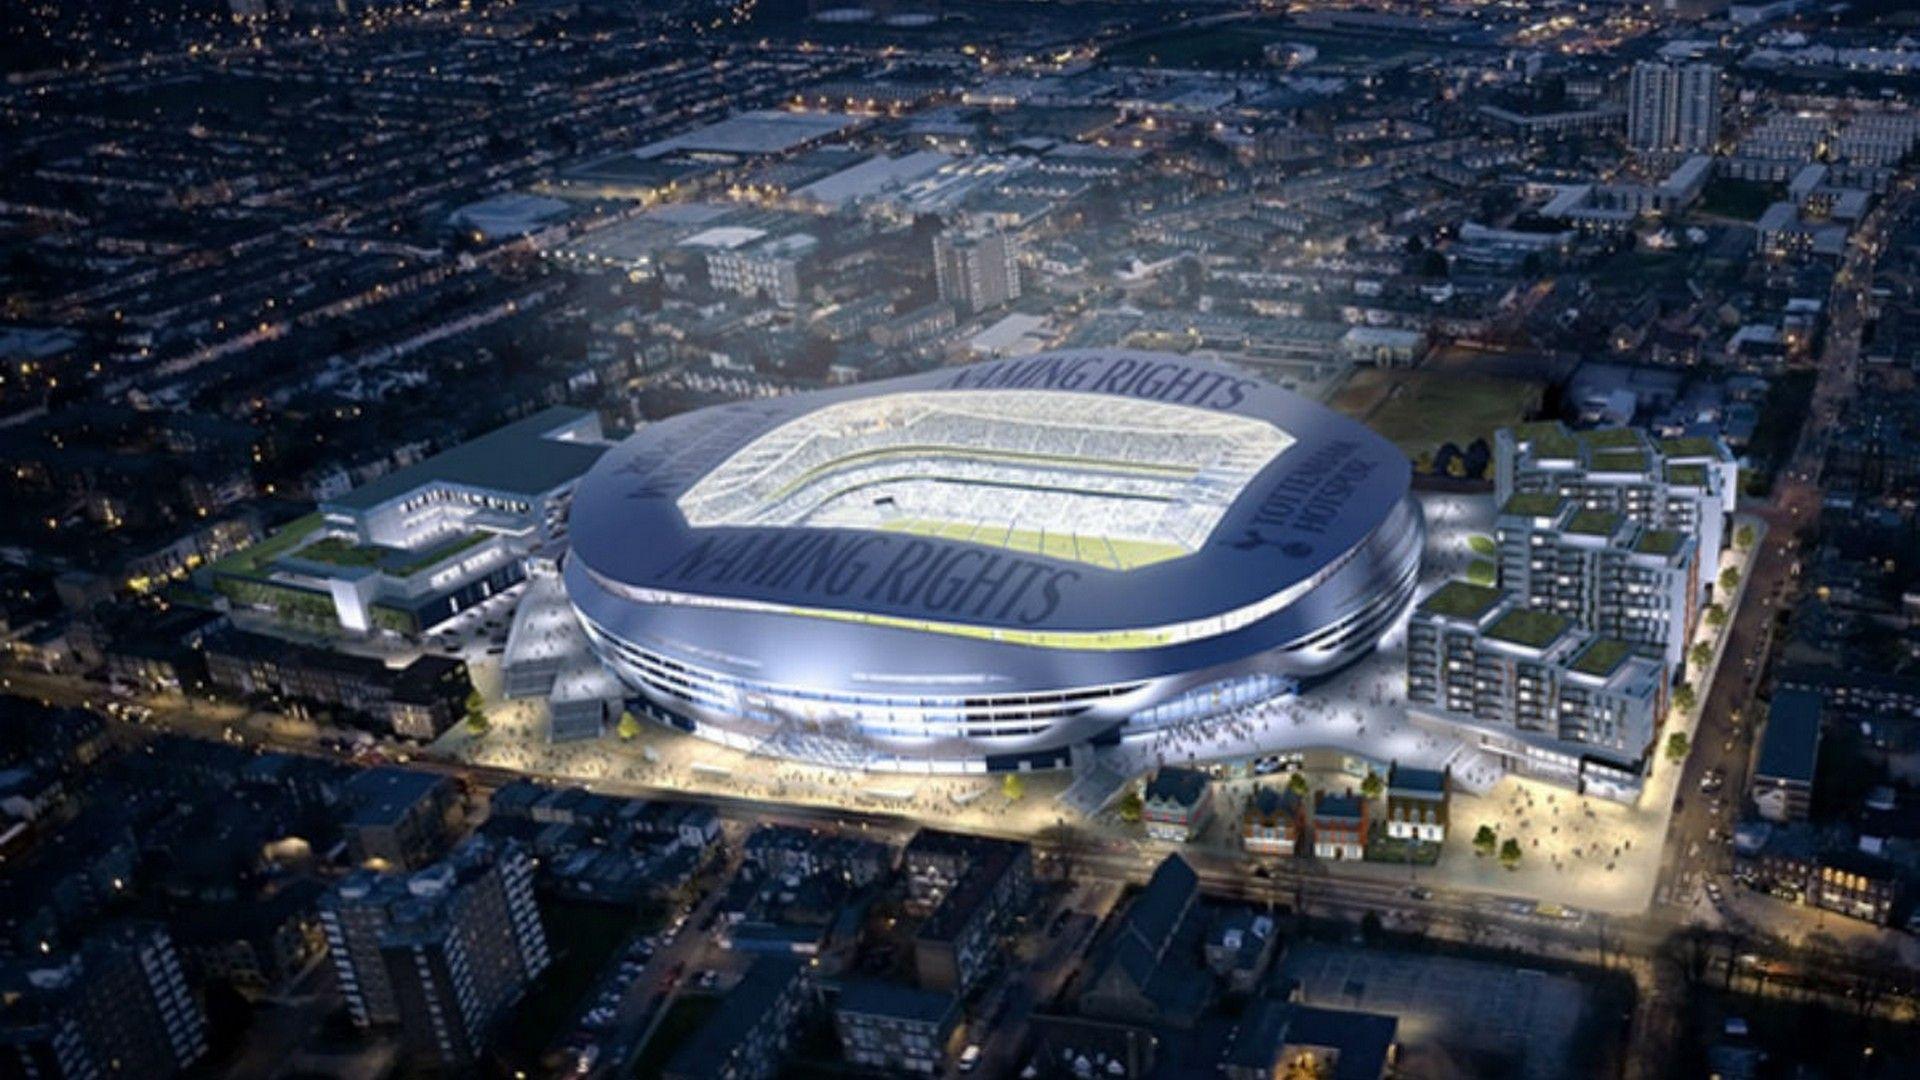 Tottenham Hotspur Stadium Desktop Wallpapers Wallpaper Cave